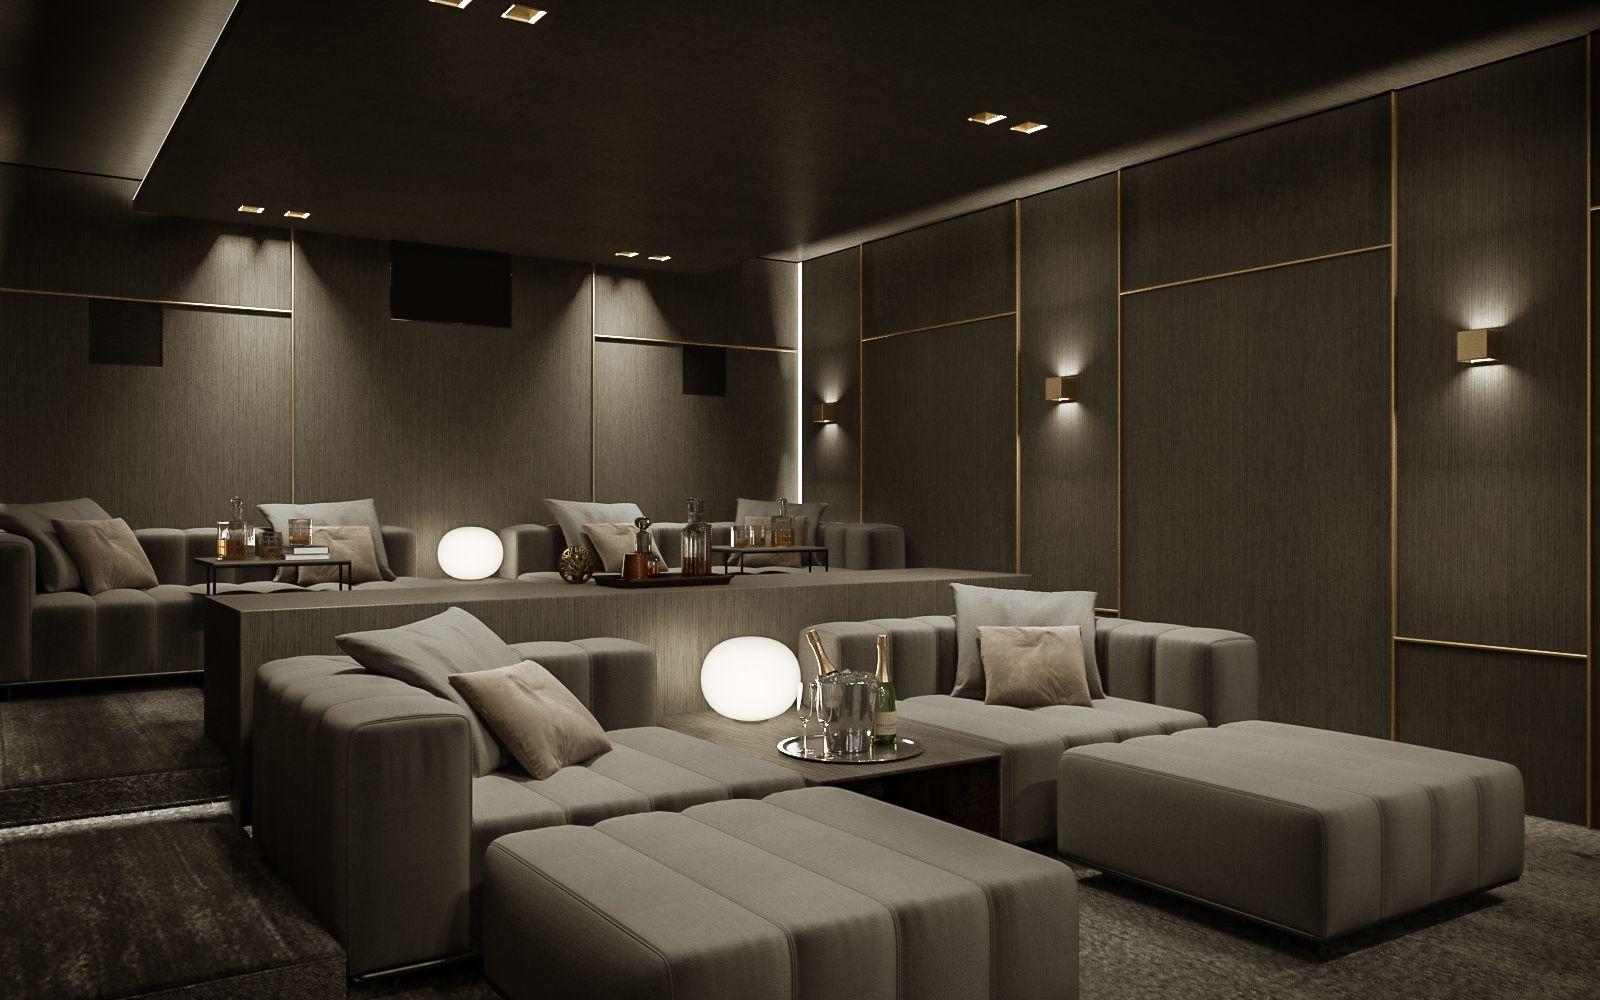 Private Home Theater 1133